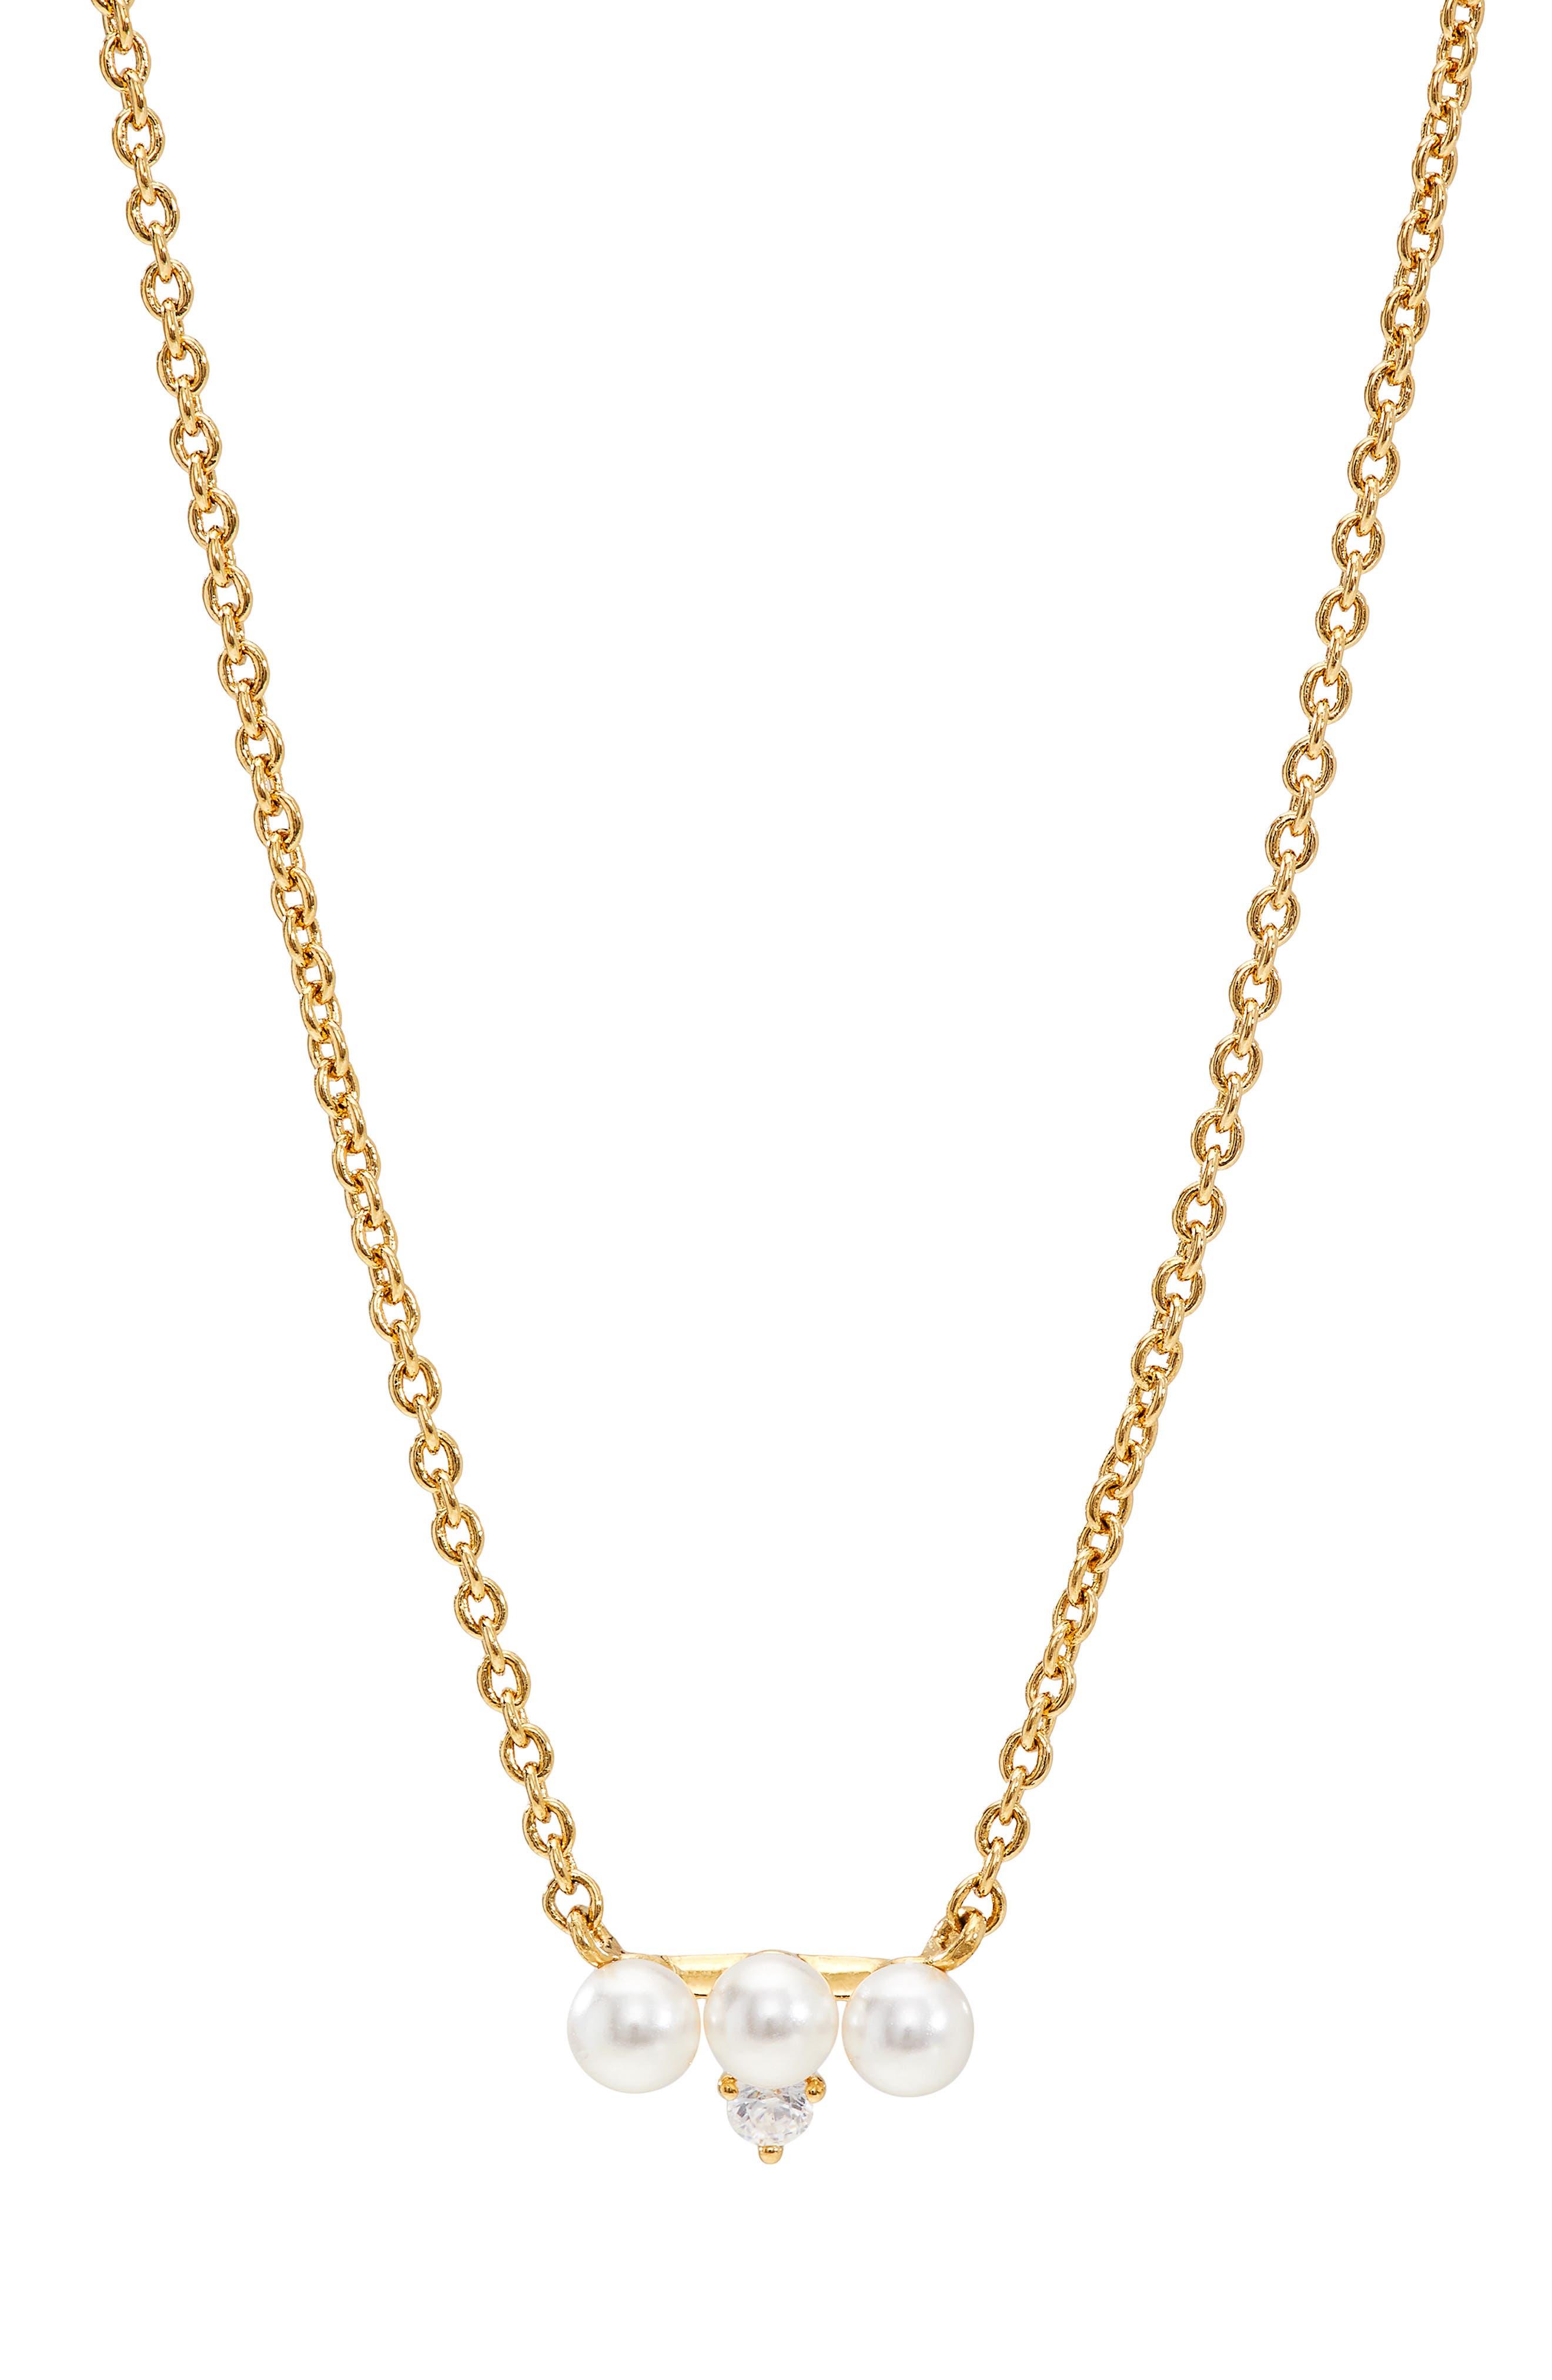 Imitation Pearl & Cubic Zirconia Necklace